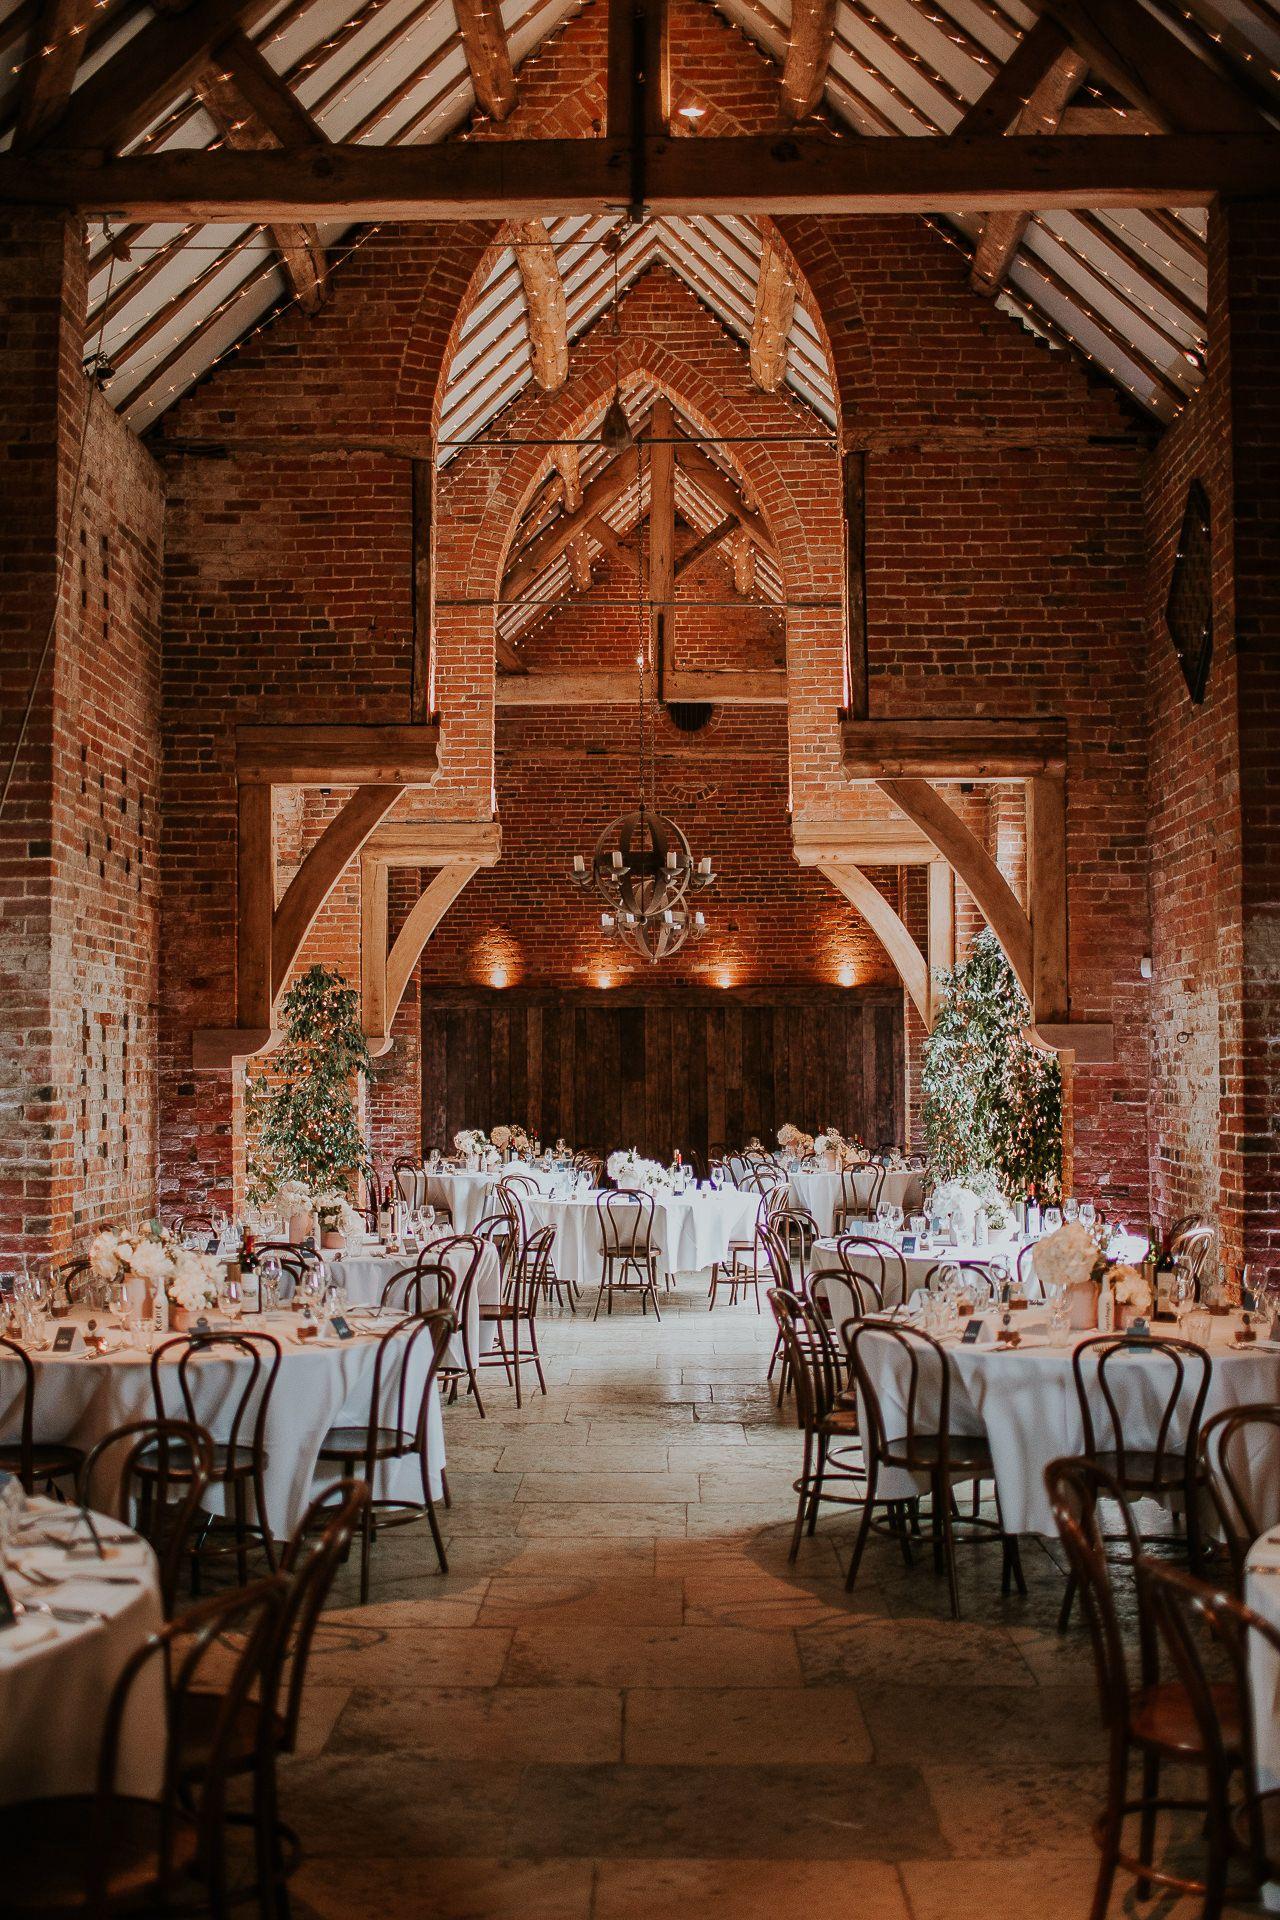 Shustoke Farm Barns Wedding Venue Katie Ross By D A Photography Contemporary Uk Destination Photographer